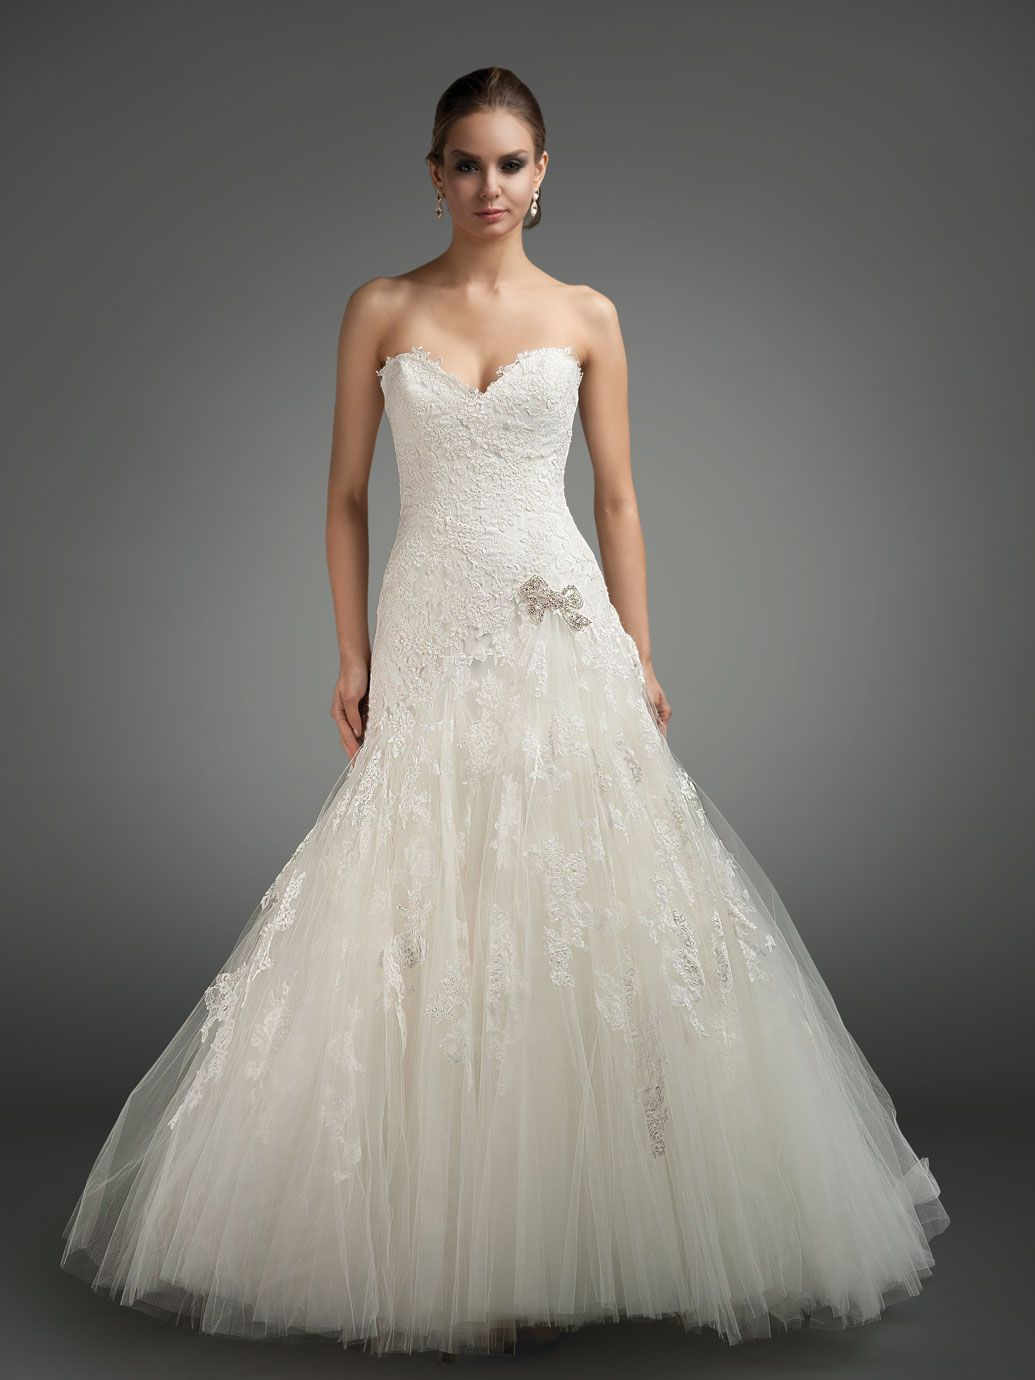 Bella Swan S Wedding Dress From Her Dream